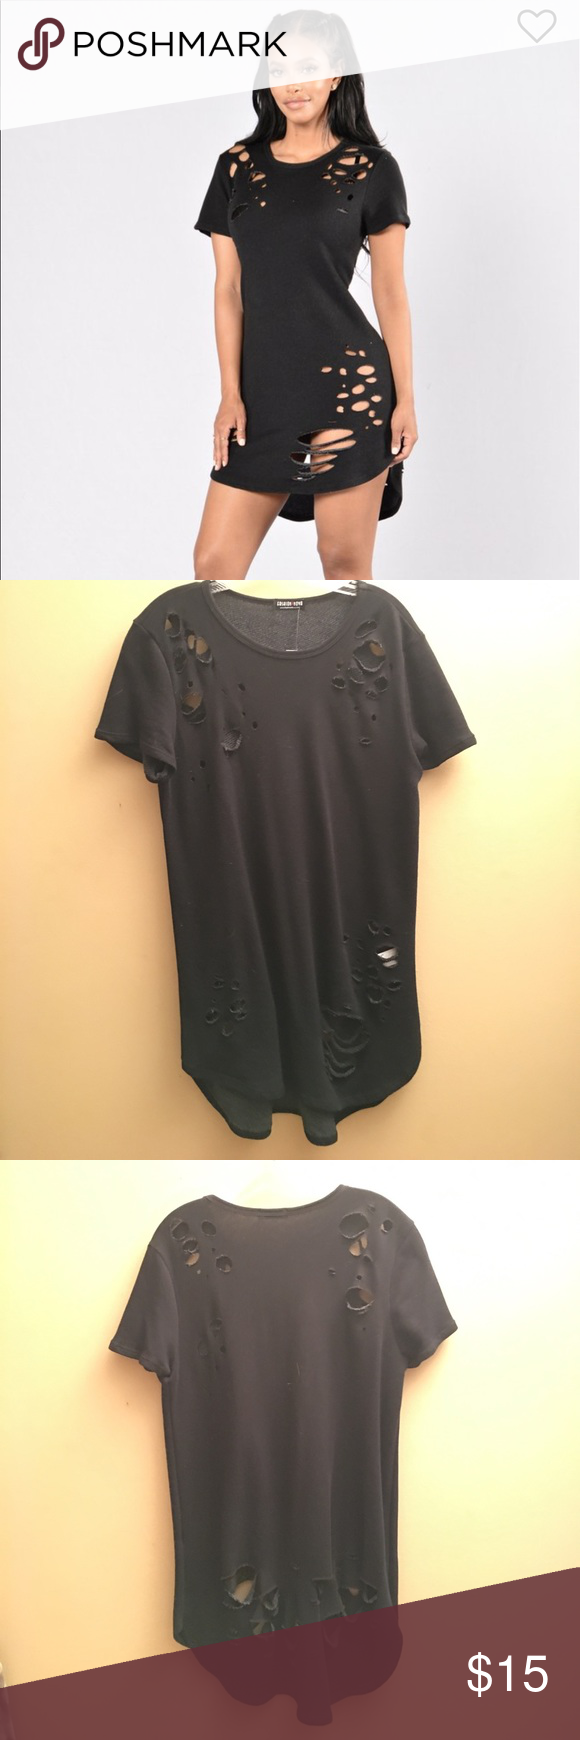 Fashion nova t shirt dress never worn! Edgy t shirt dress. Never worn. Best fits size m/l. Dresses